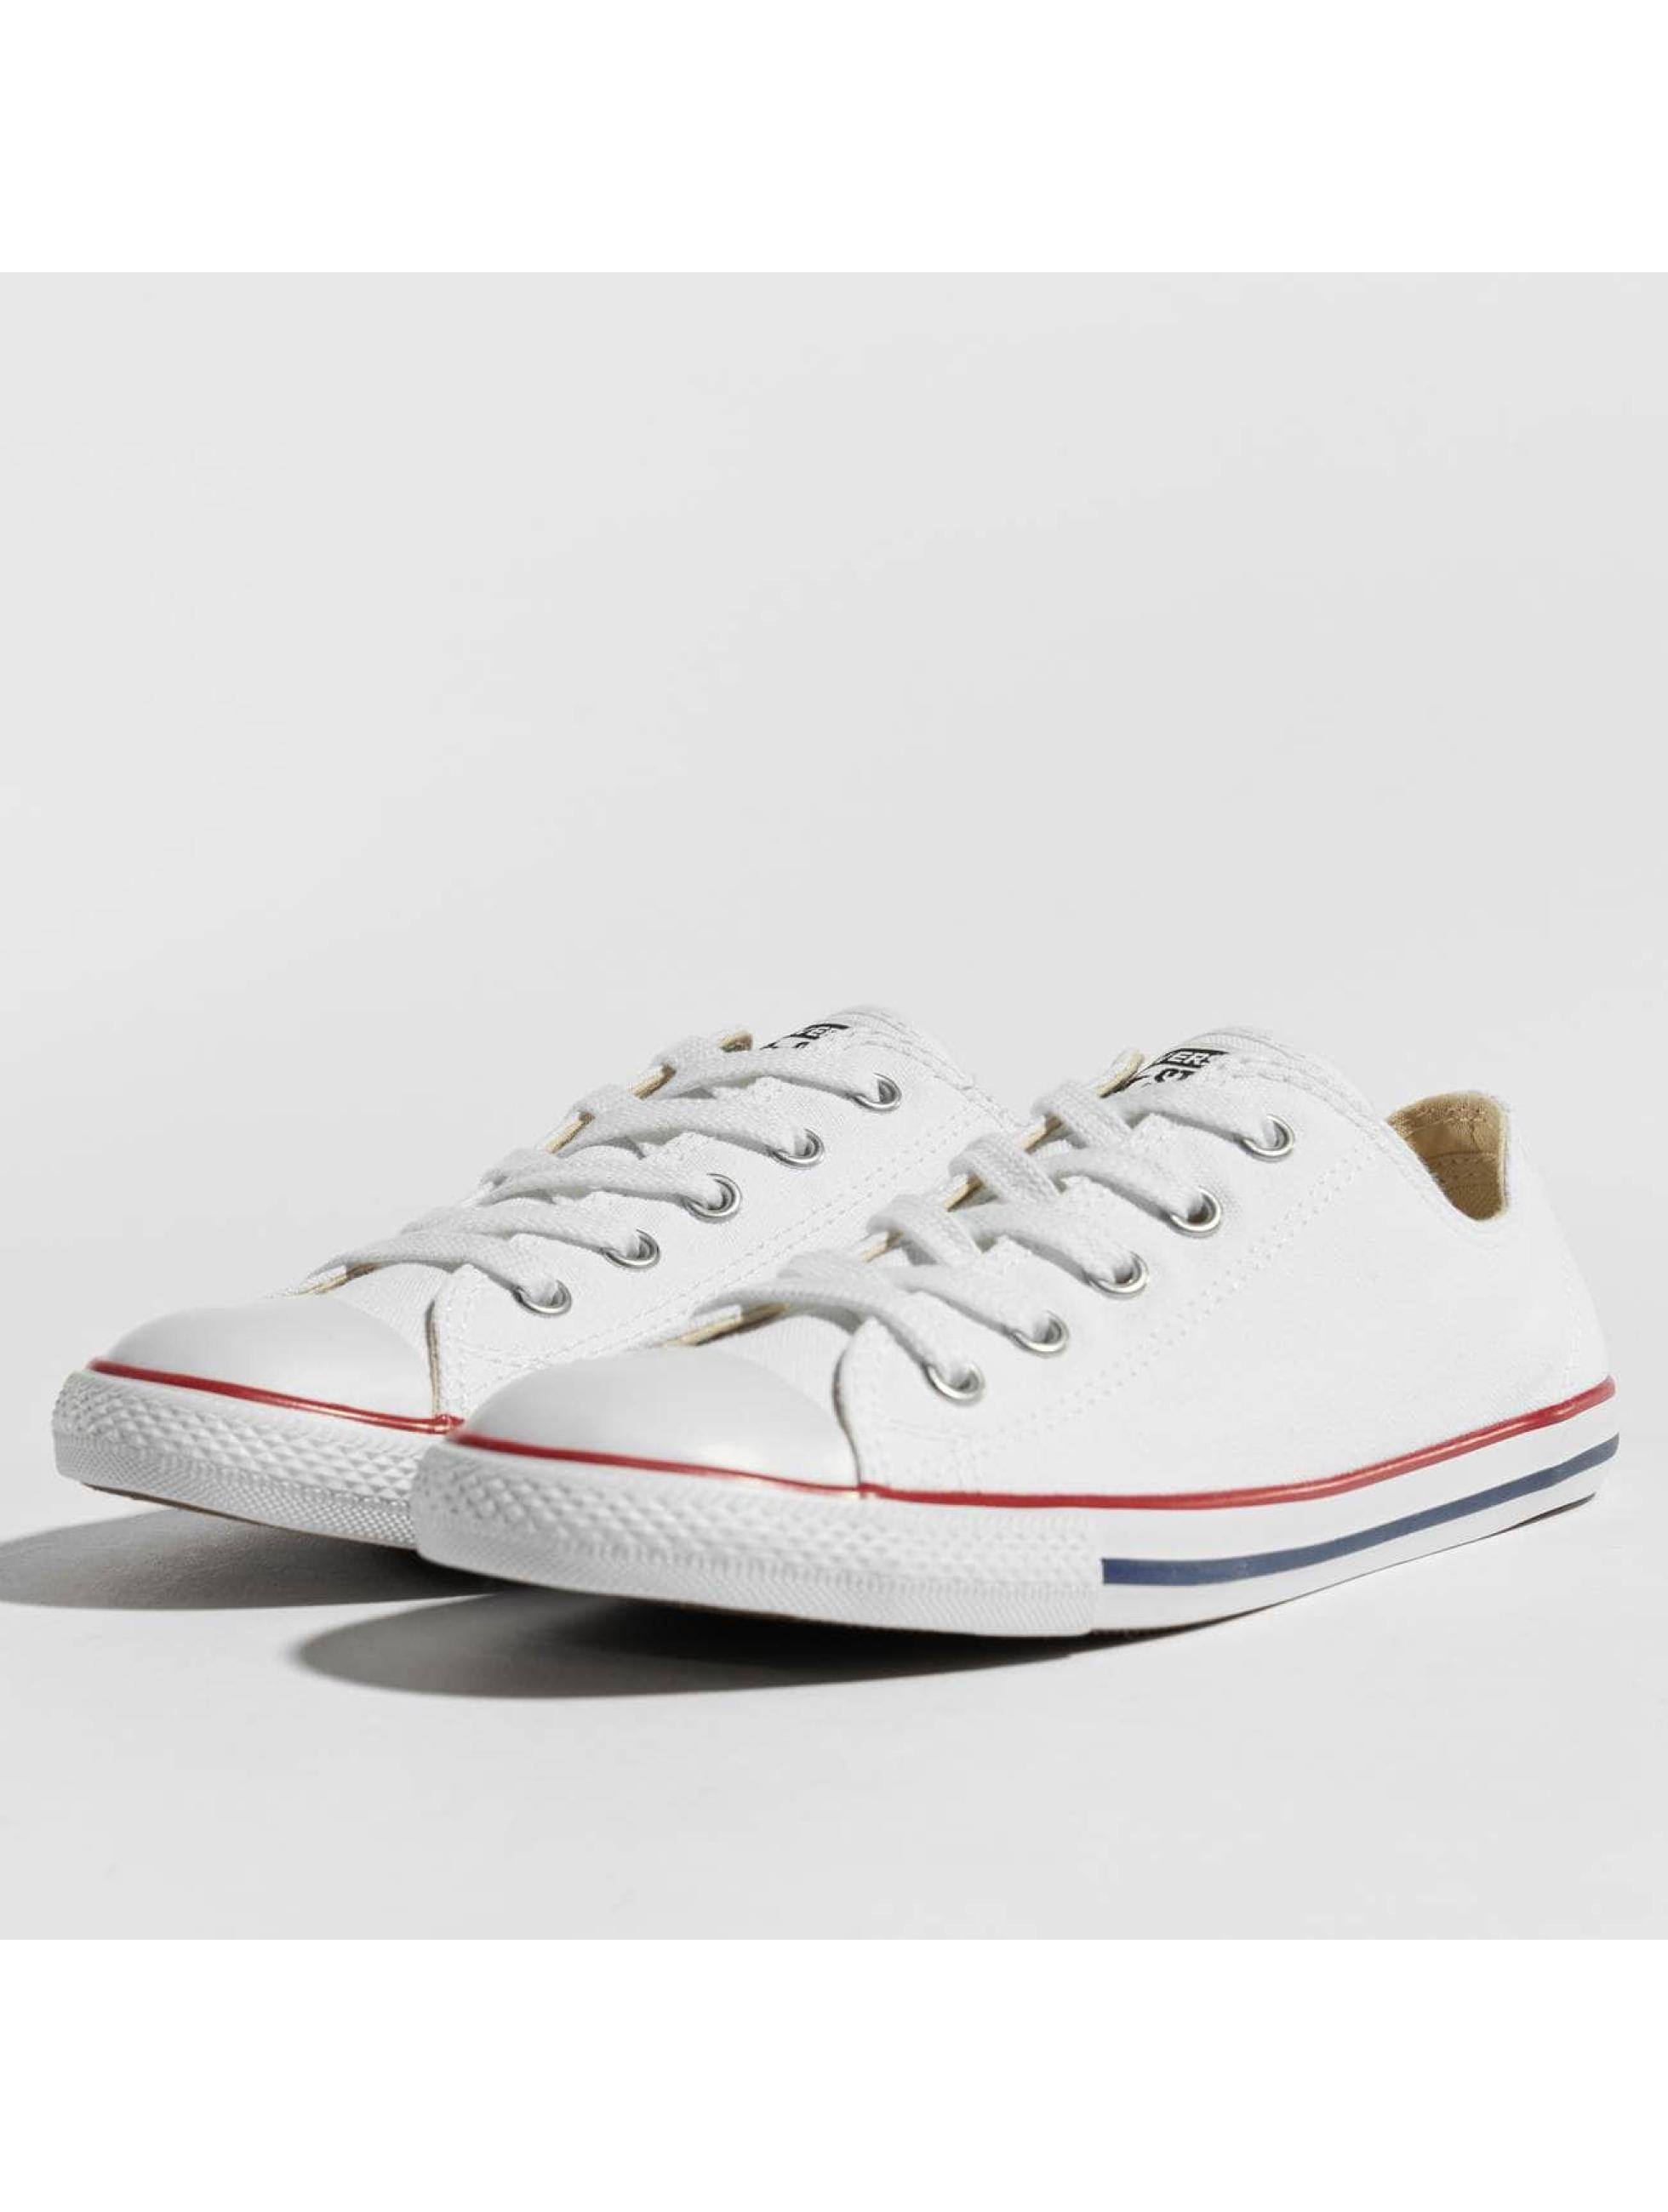 Converse Chaussures / Baskets All Star Dainty Ox Chucks en blanc